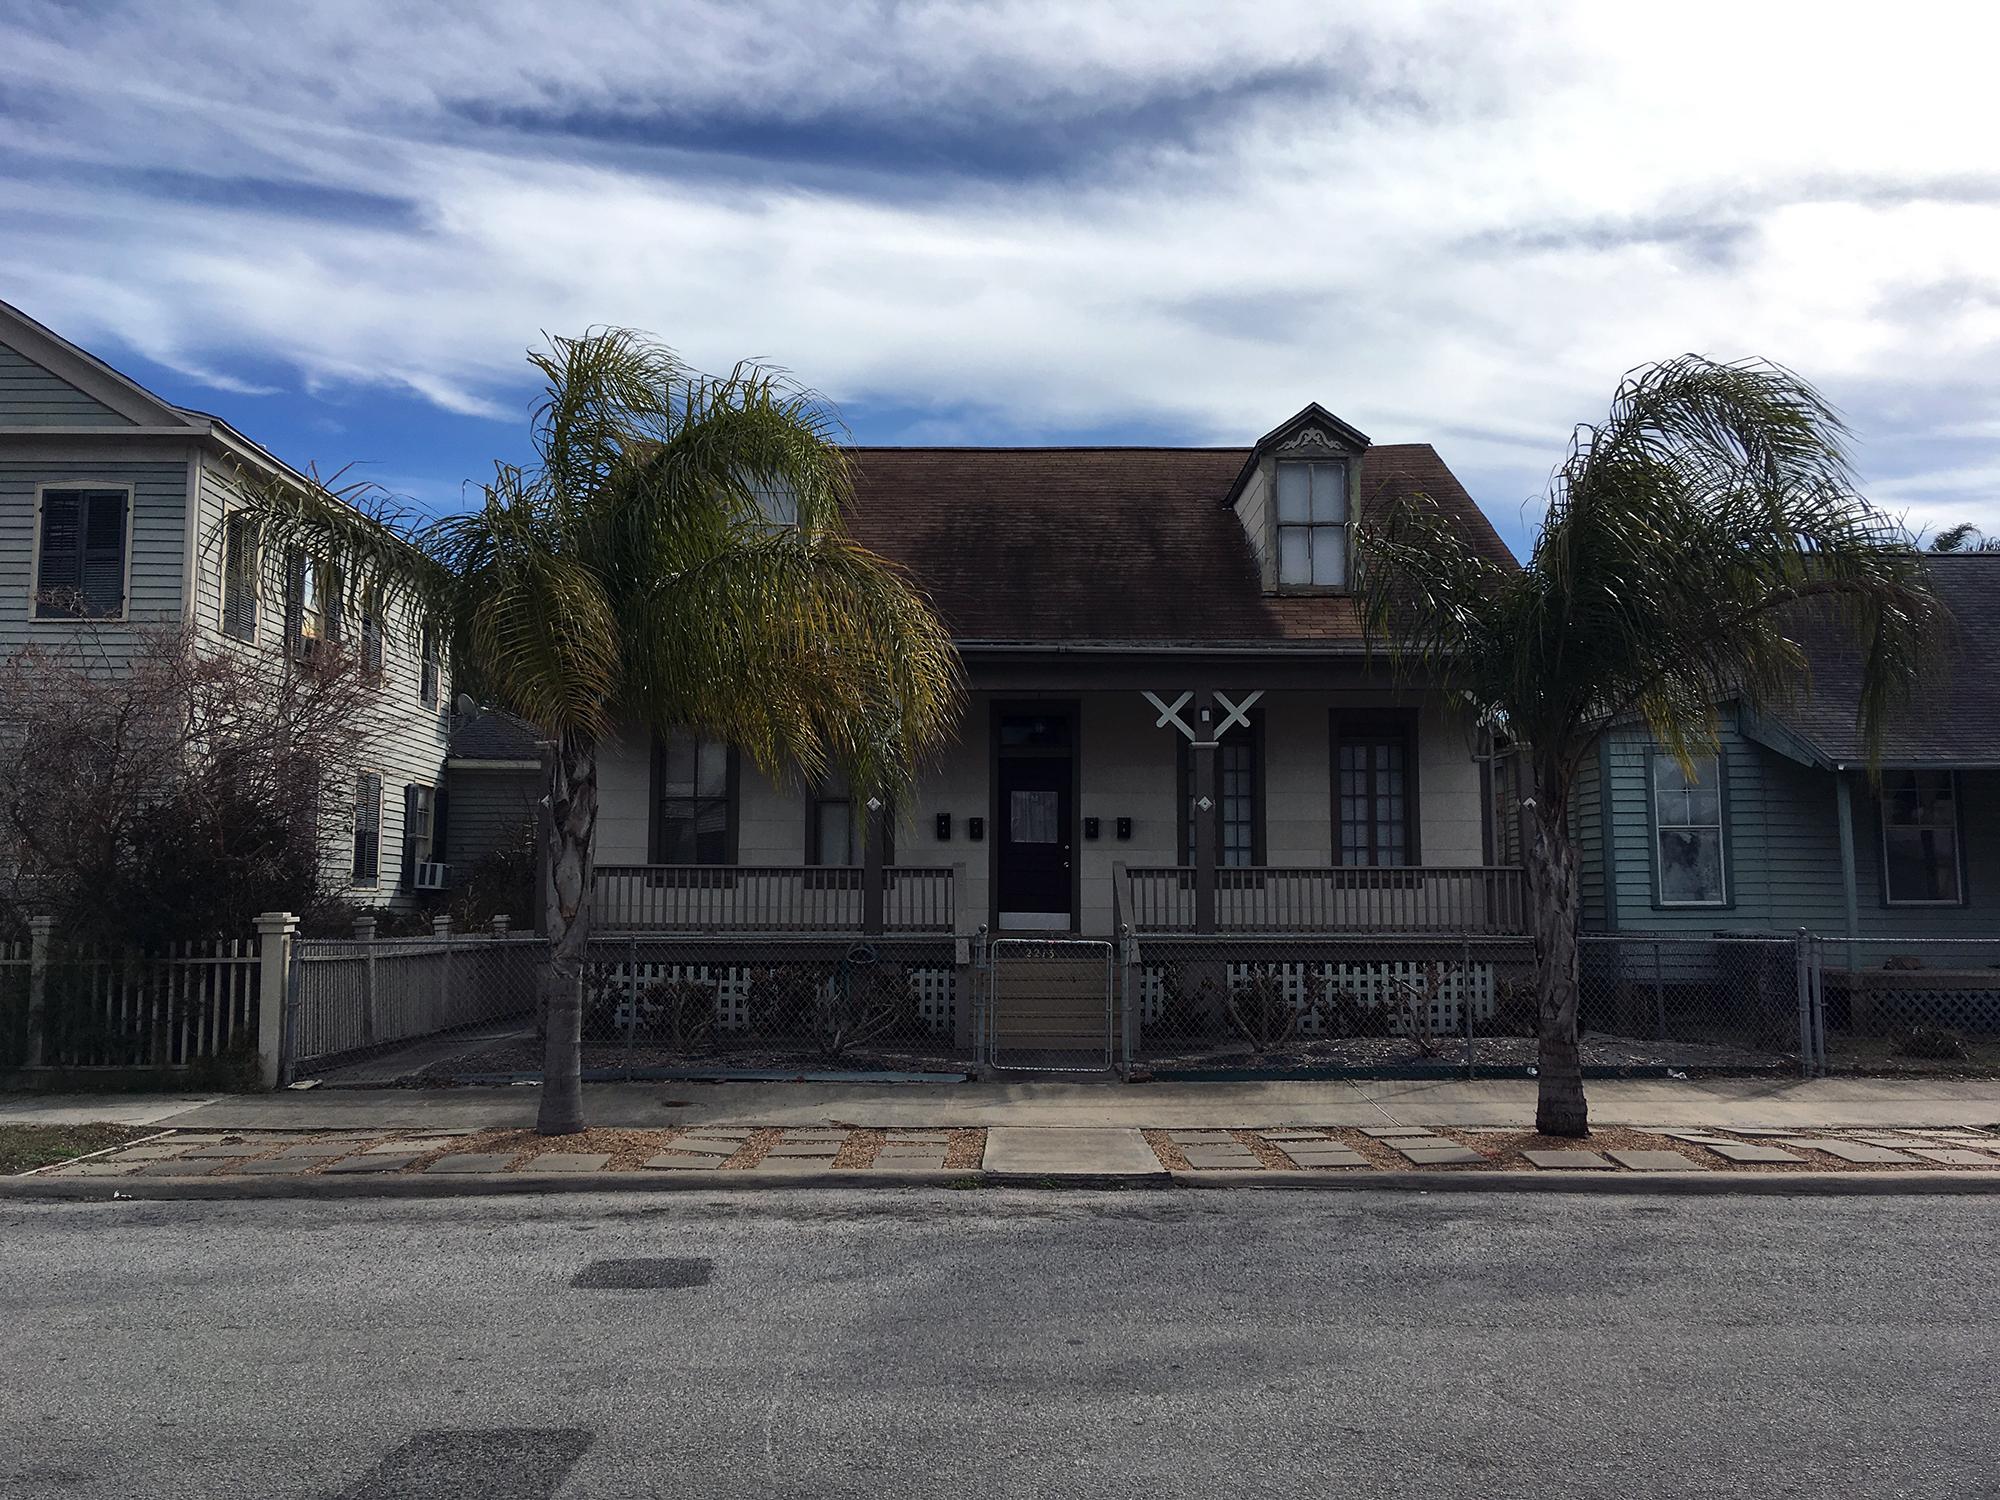 Generic Van Life - Third Coast Robert Durst House